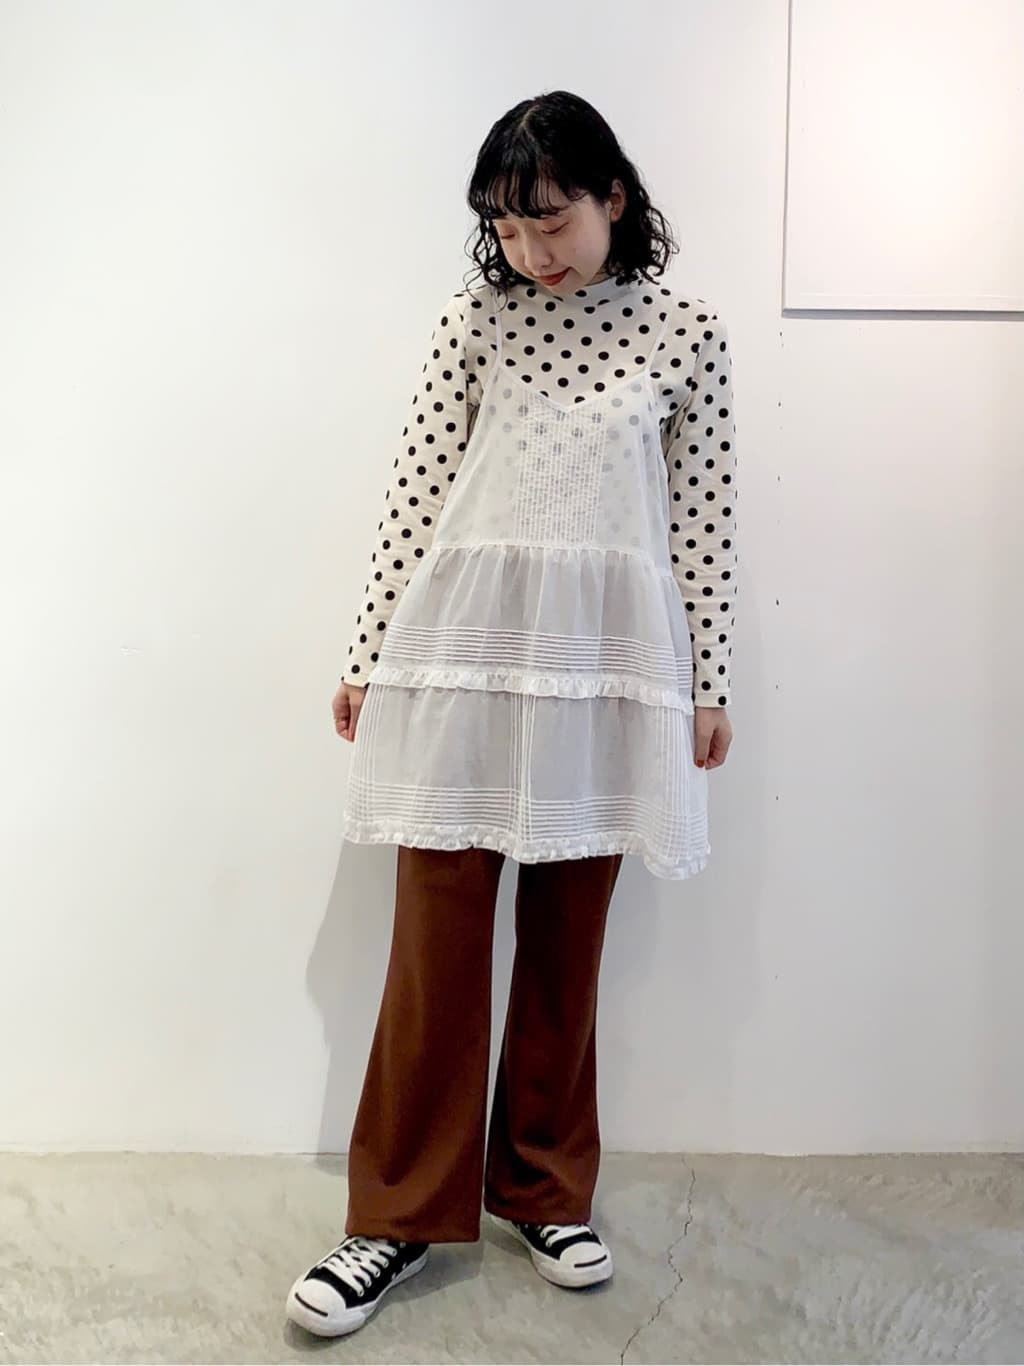 - CHILD WOMAN CHILD WOMAN , PAR ICI ルミネ横浜 身長:157cm 2021.09.21